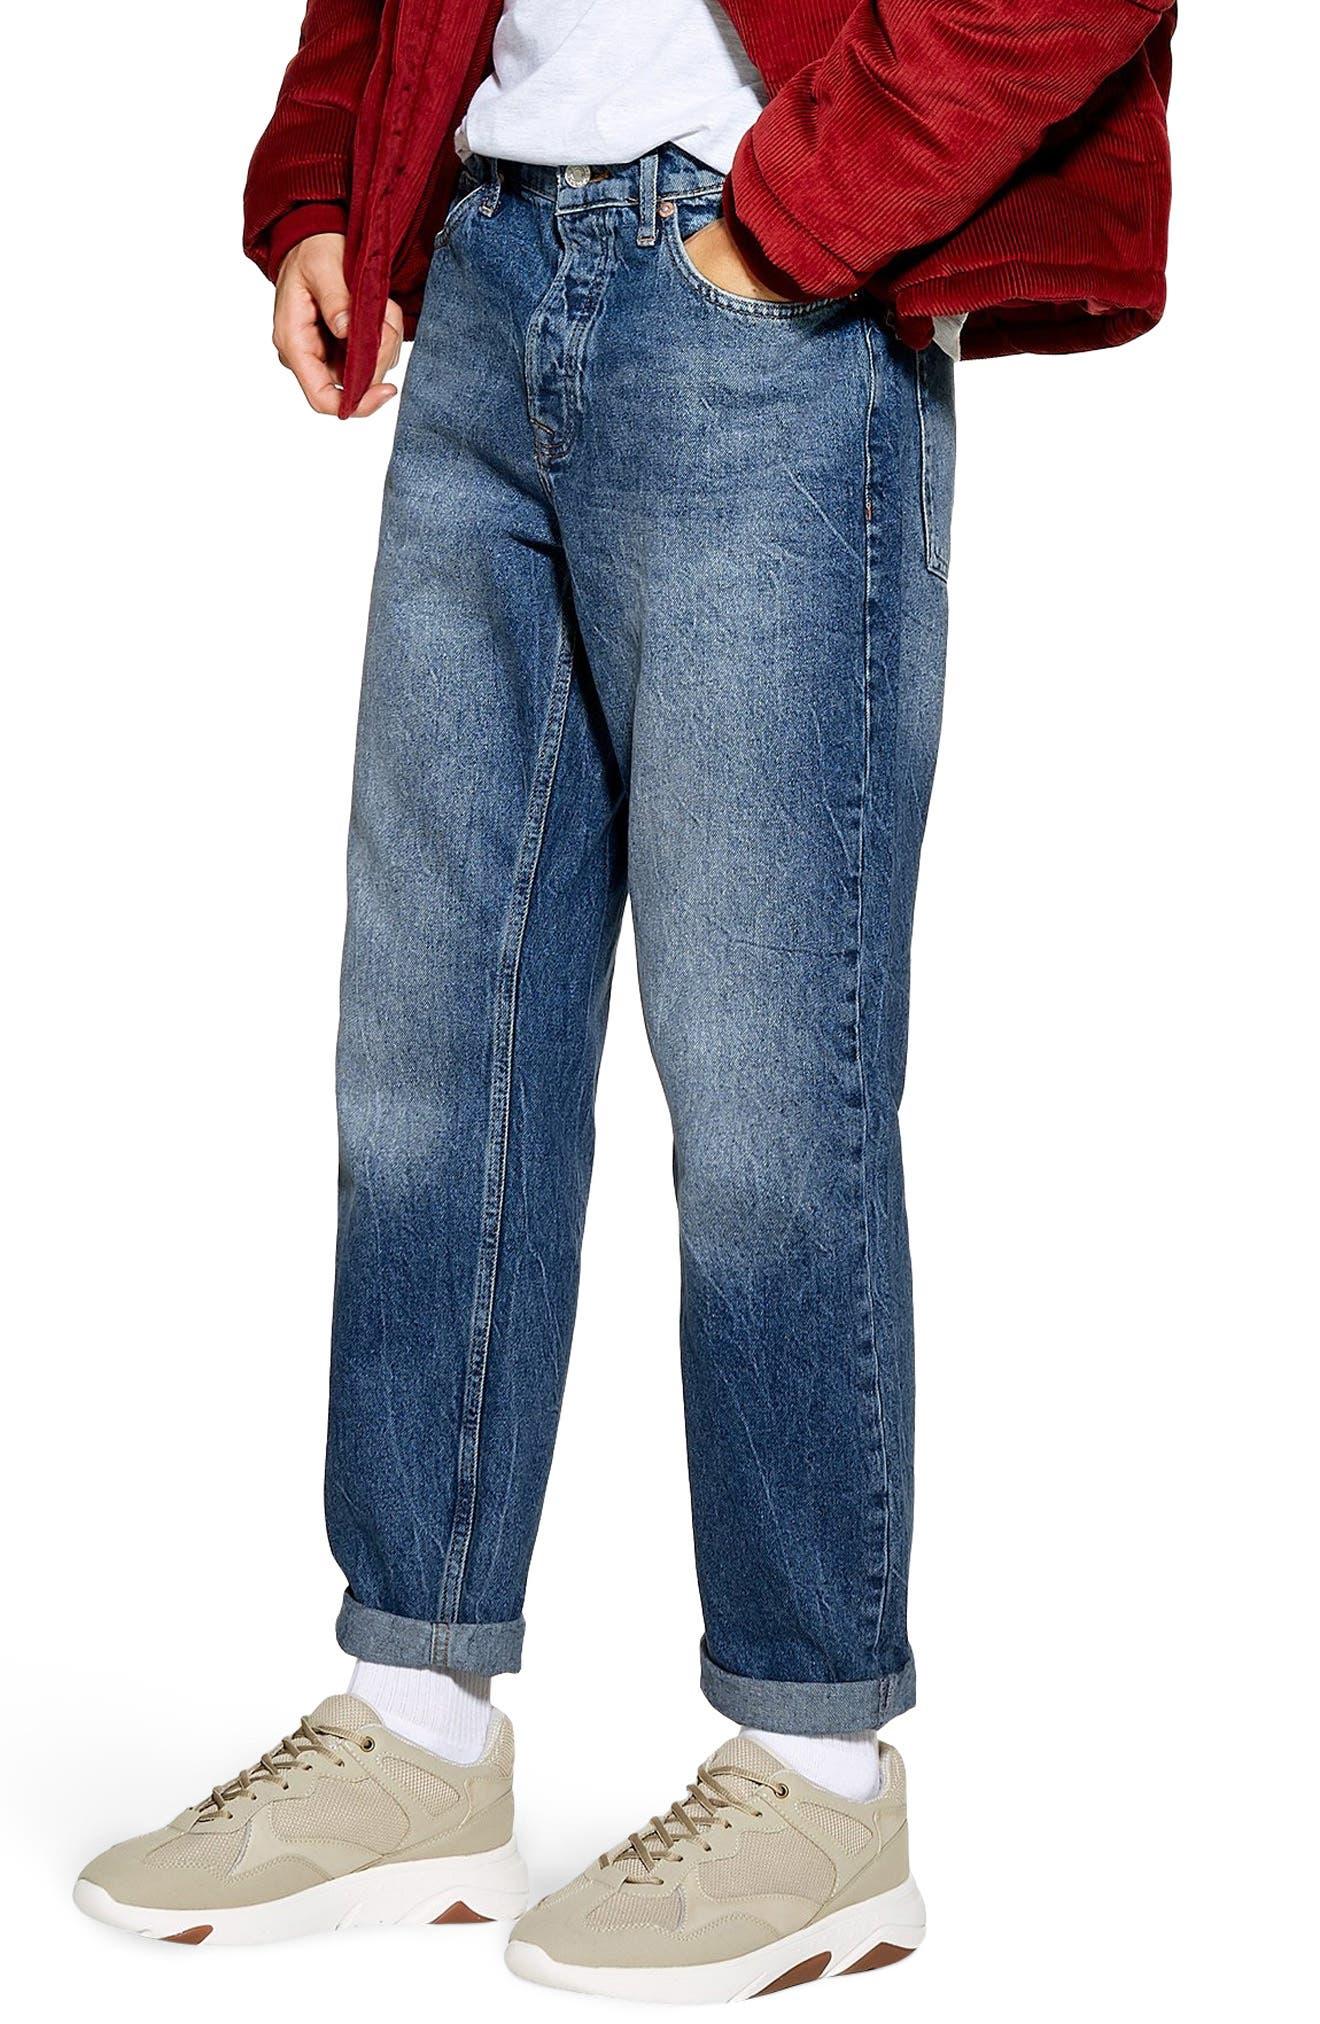 Billy Original Fit Jeans by Topman